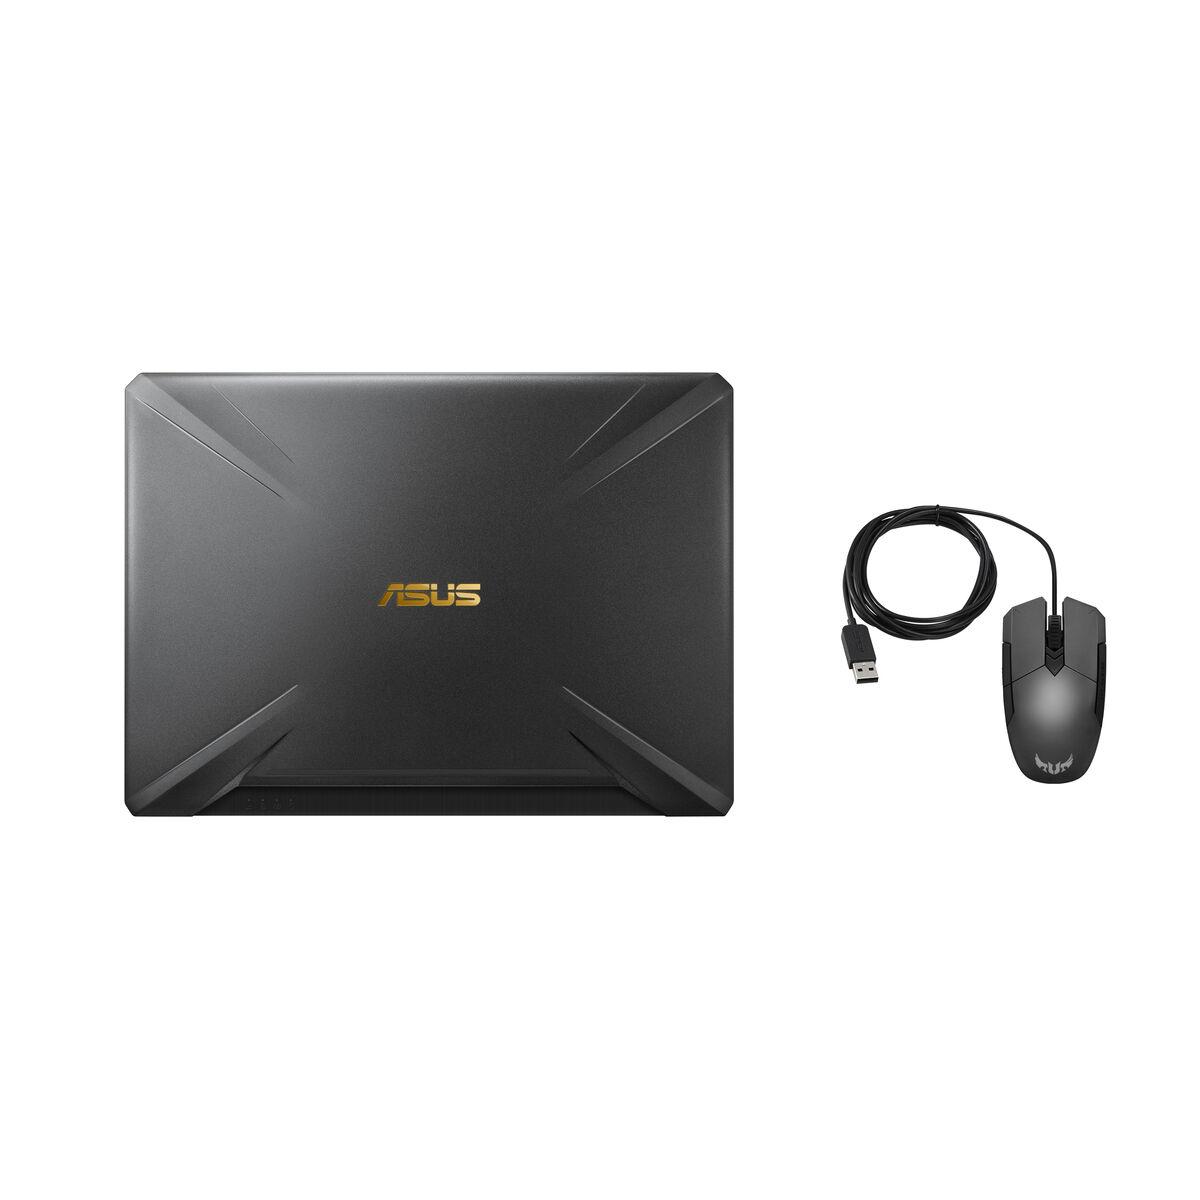 "Notebook Gamer Asus TUF FX505DT-BQ404T Ryzen 5-3550H 8GB 1TB 15.6"" NVIDIA GTX1650 4GB"